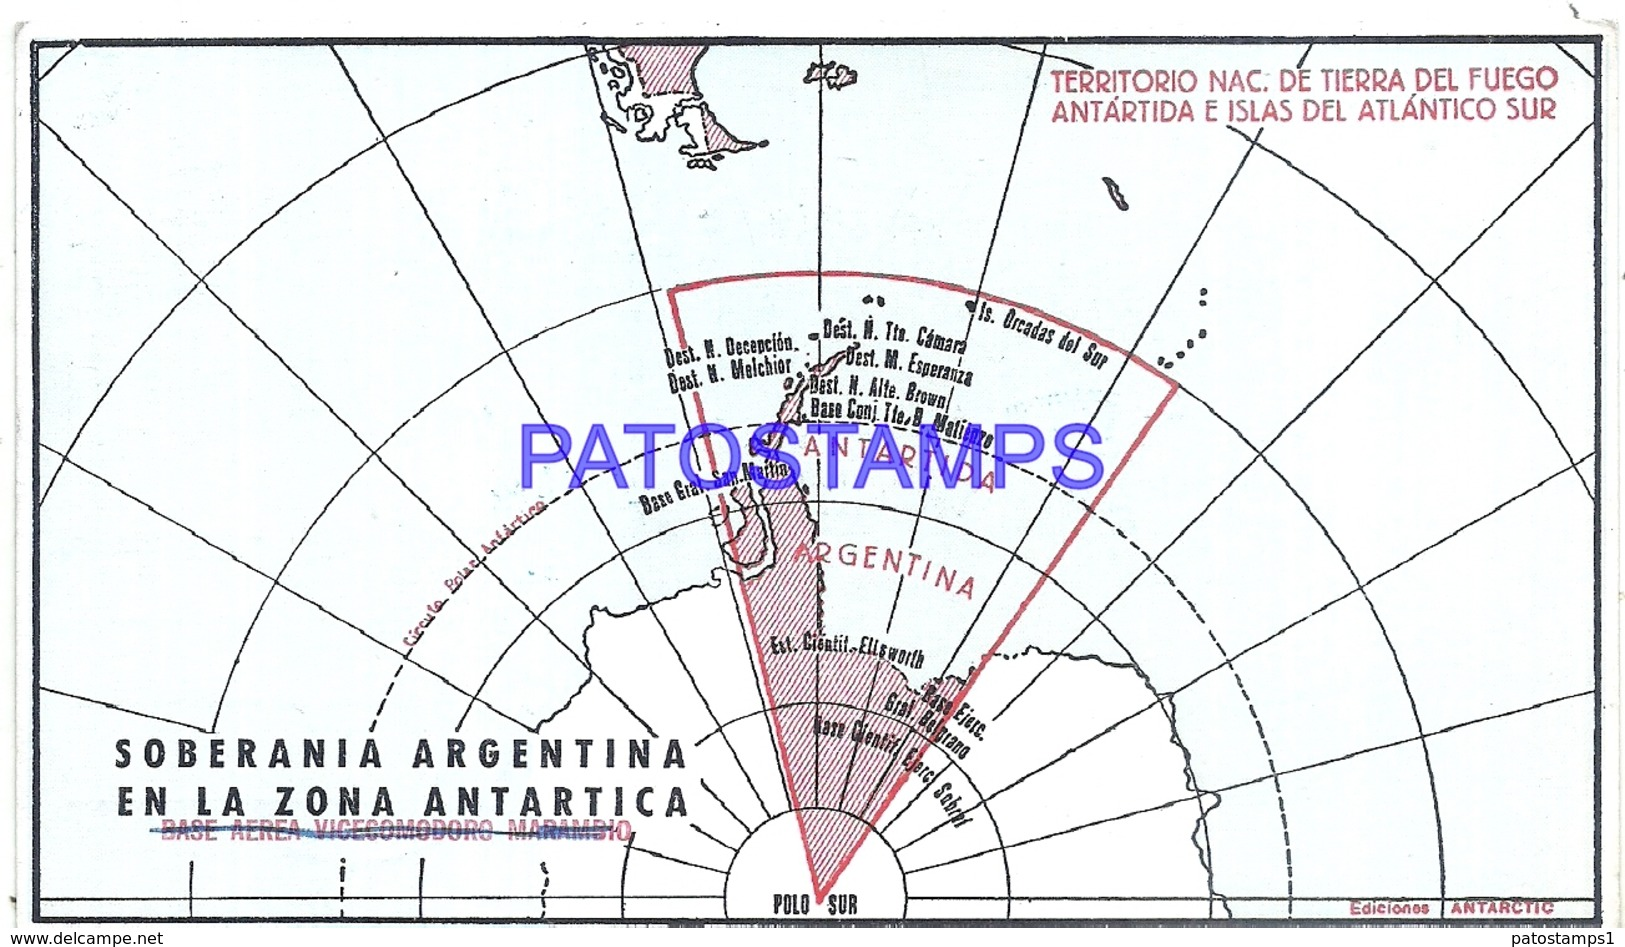 117459 ARGENTINA ANTARTIDA ANTARCTICA MAP CRUCERO LIBERTAD 1972 CIRCULATED TO BUENOS AIRES POSTCARD - Argentinien